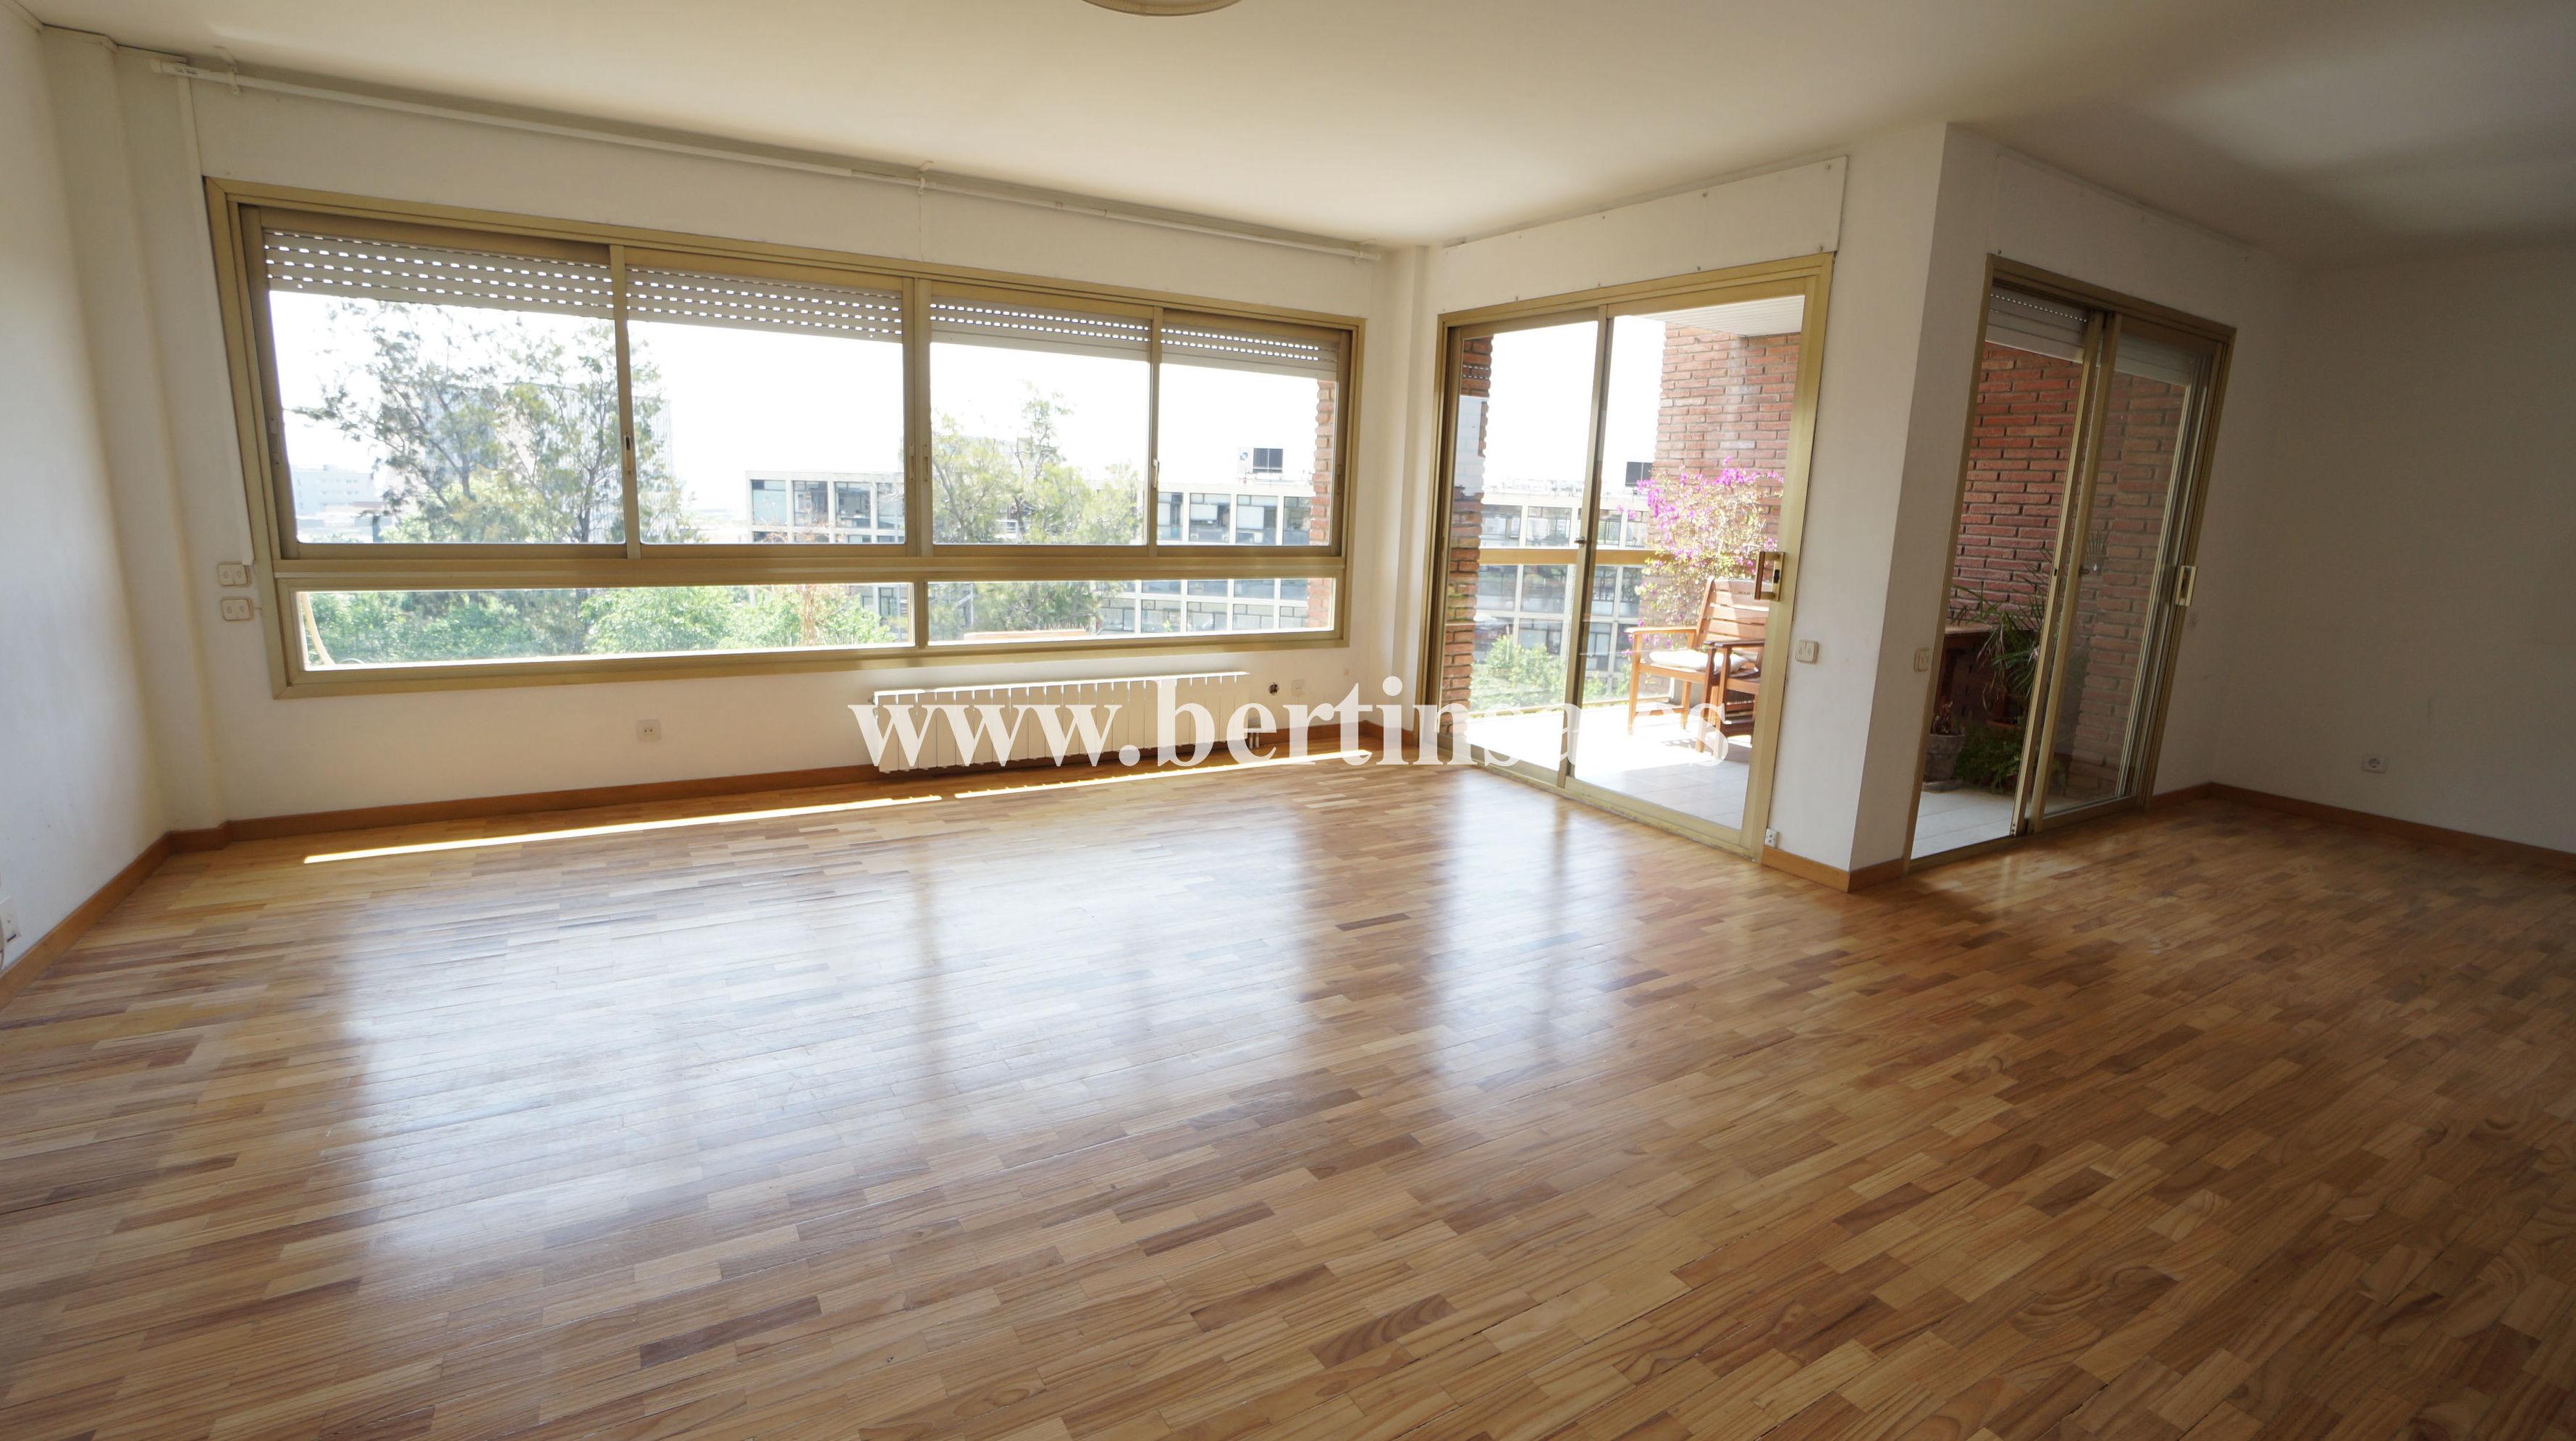 Avenida Exercit - (Pedralbes)  895.000€: Visita nuestras inmuebles de Bertinsa Real Estate, Investments & Sale Services